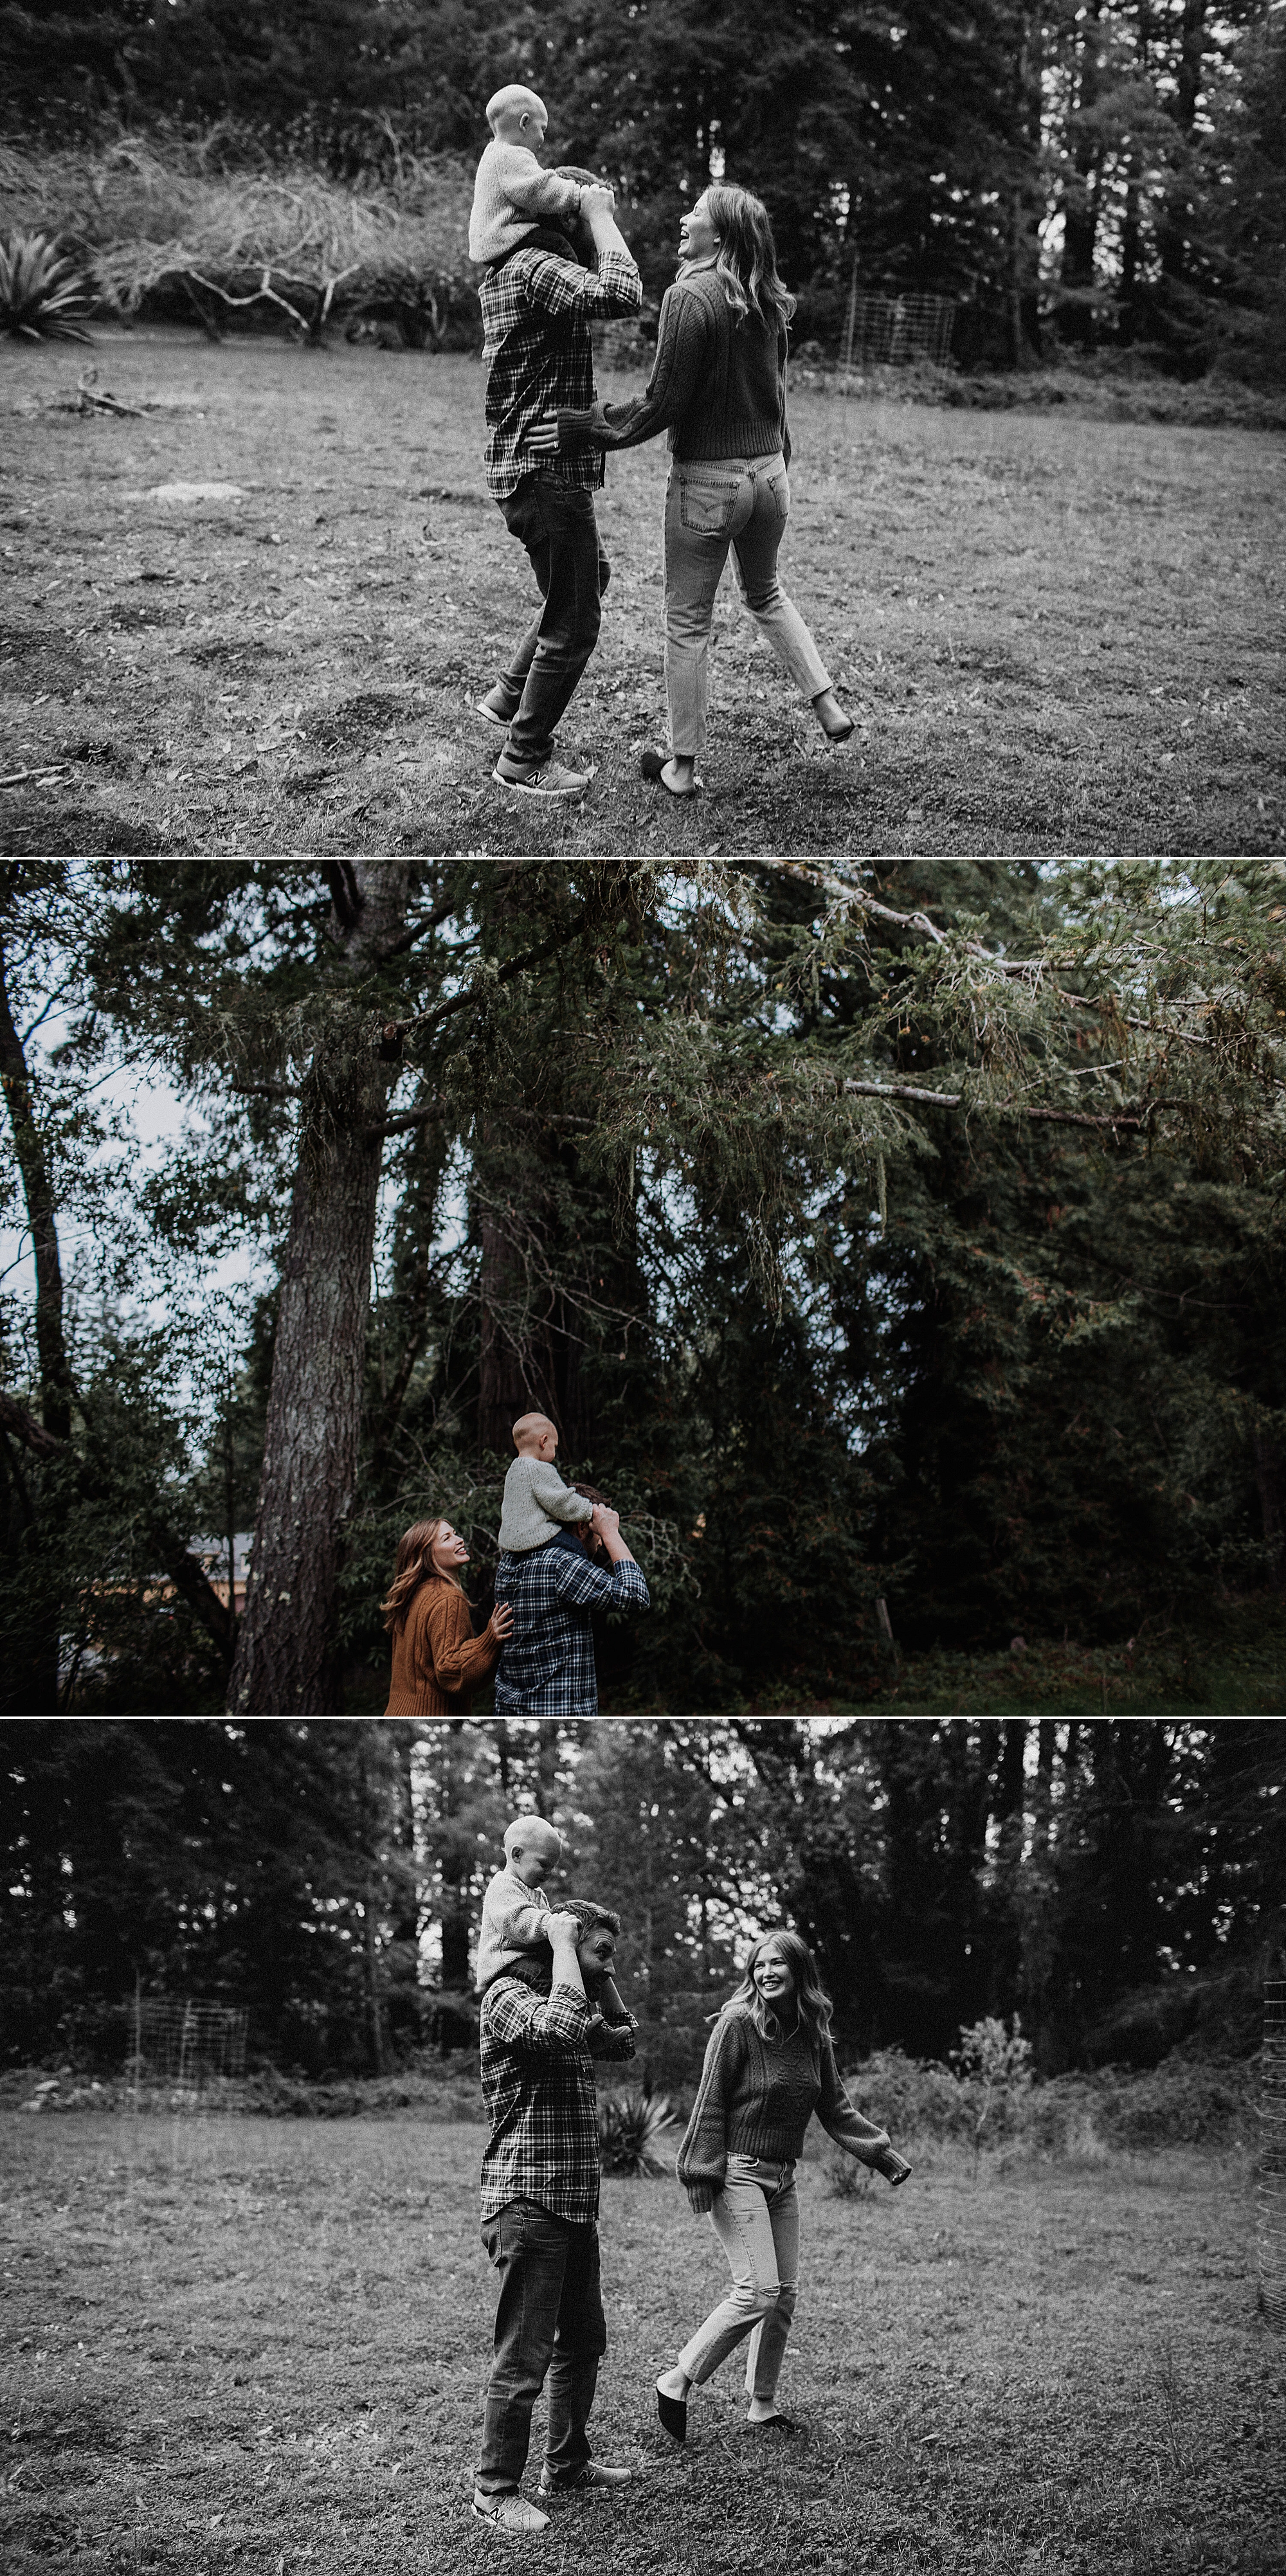 Sebastopol Family Photography | Gretchen Gause | #bayareafamilyphotographer #Doen #Mamaandme #stlyishmama #mamaandbaby #shopdoen #familyphotos